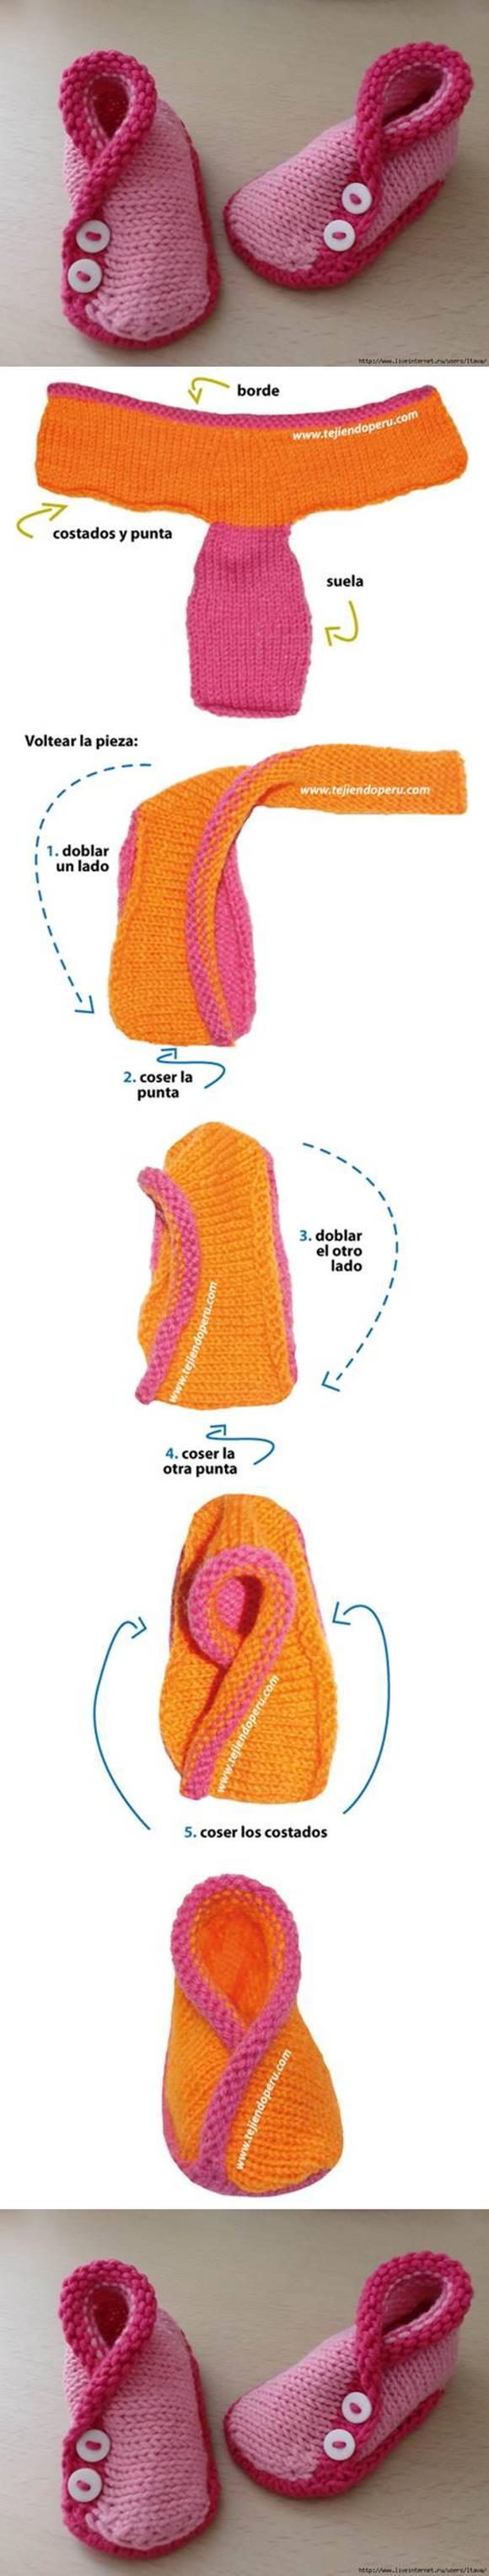 Baby Kimono Booties Knitting Pattern : DIY Adorable Knitted Kimono Baby Booties